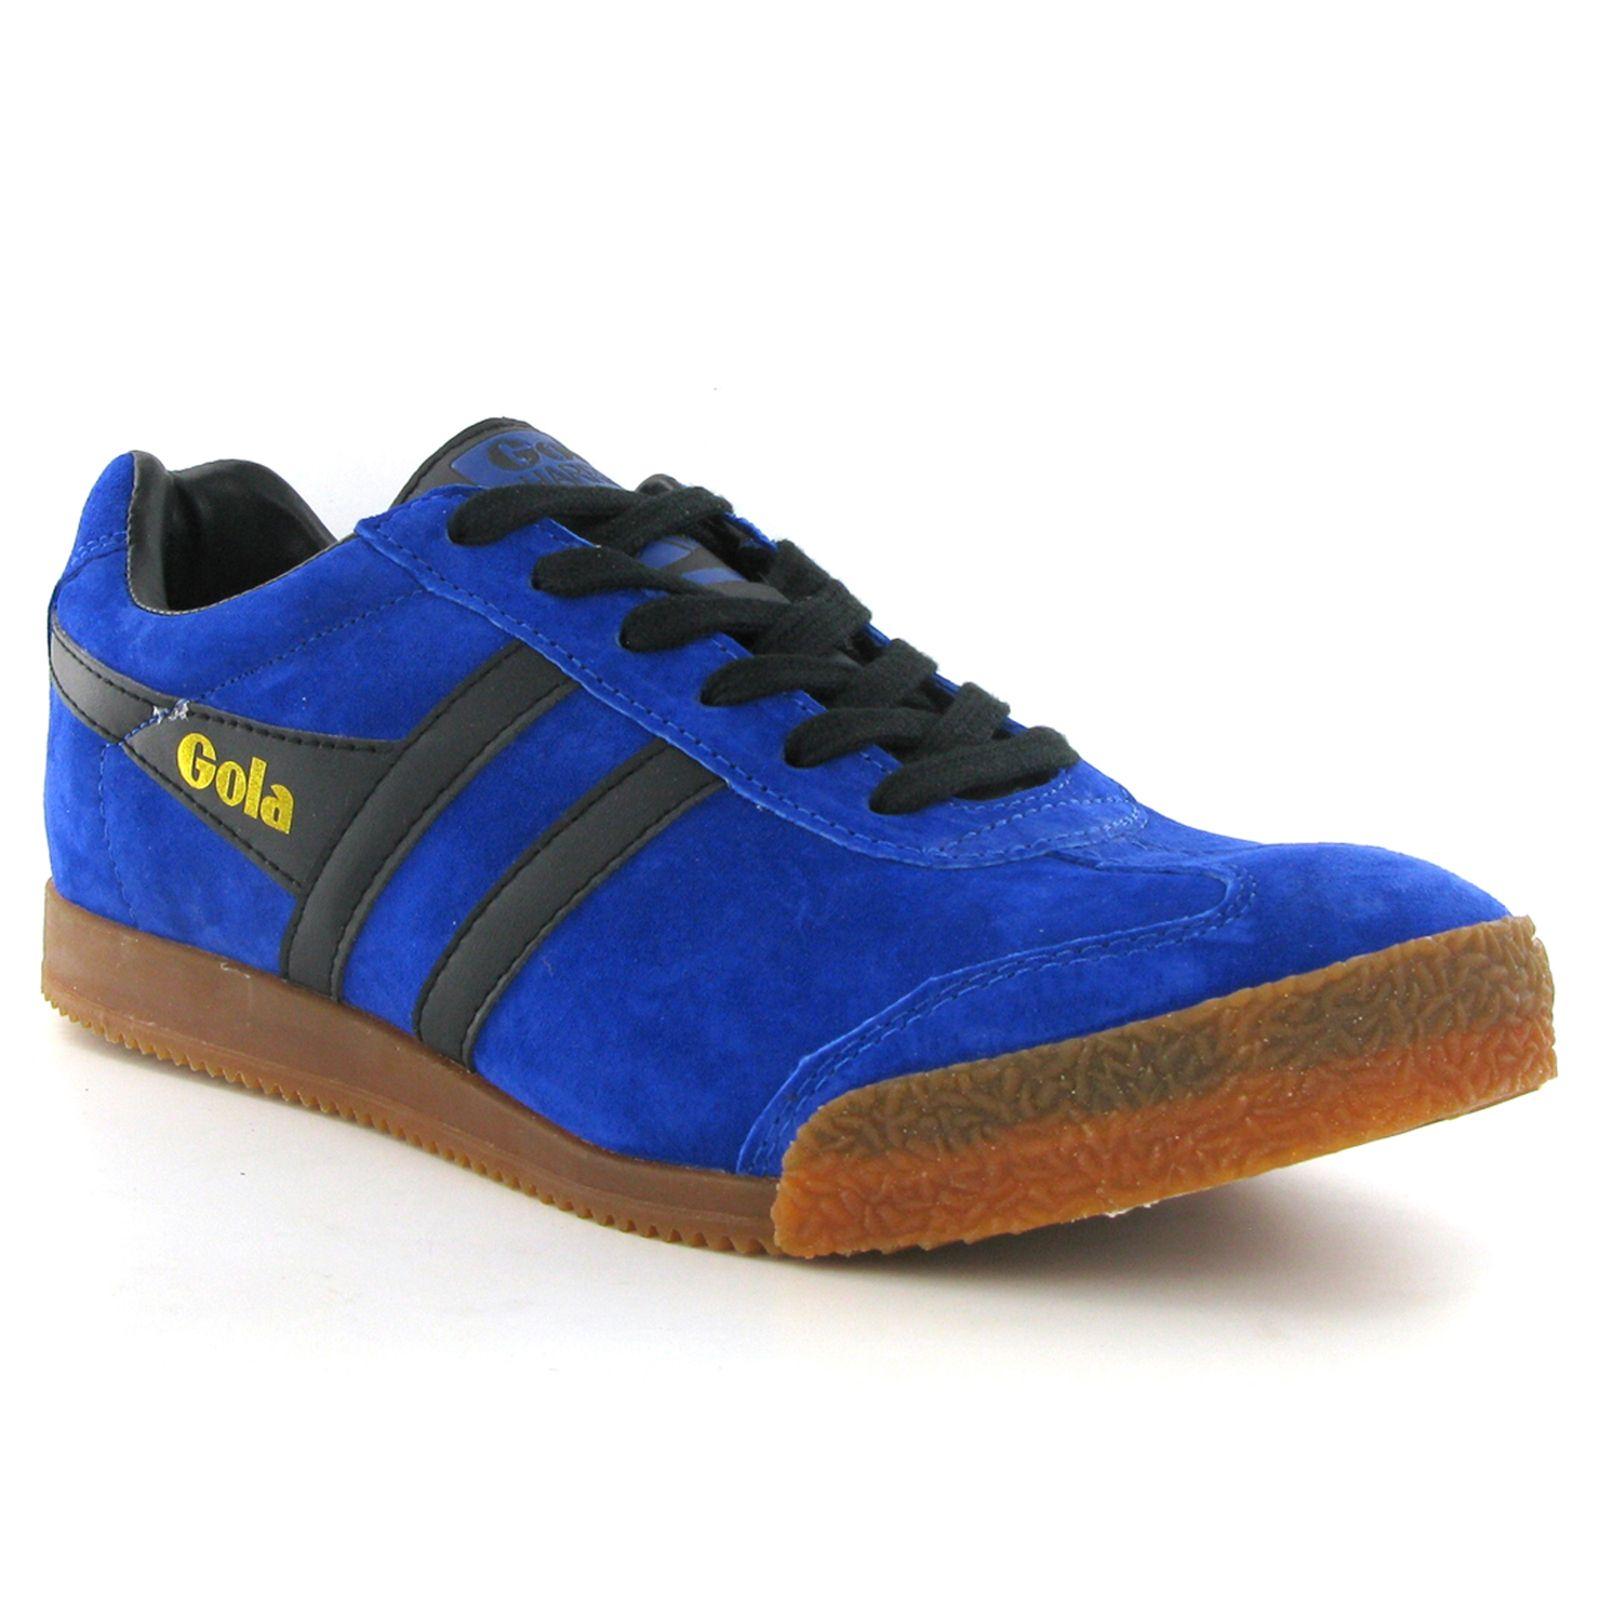 Gola Suede Athletic Shoes for Men